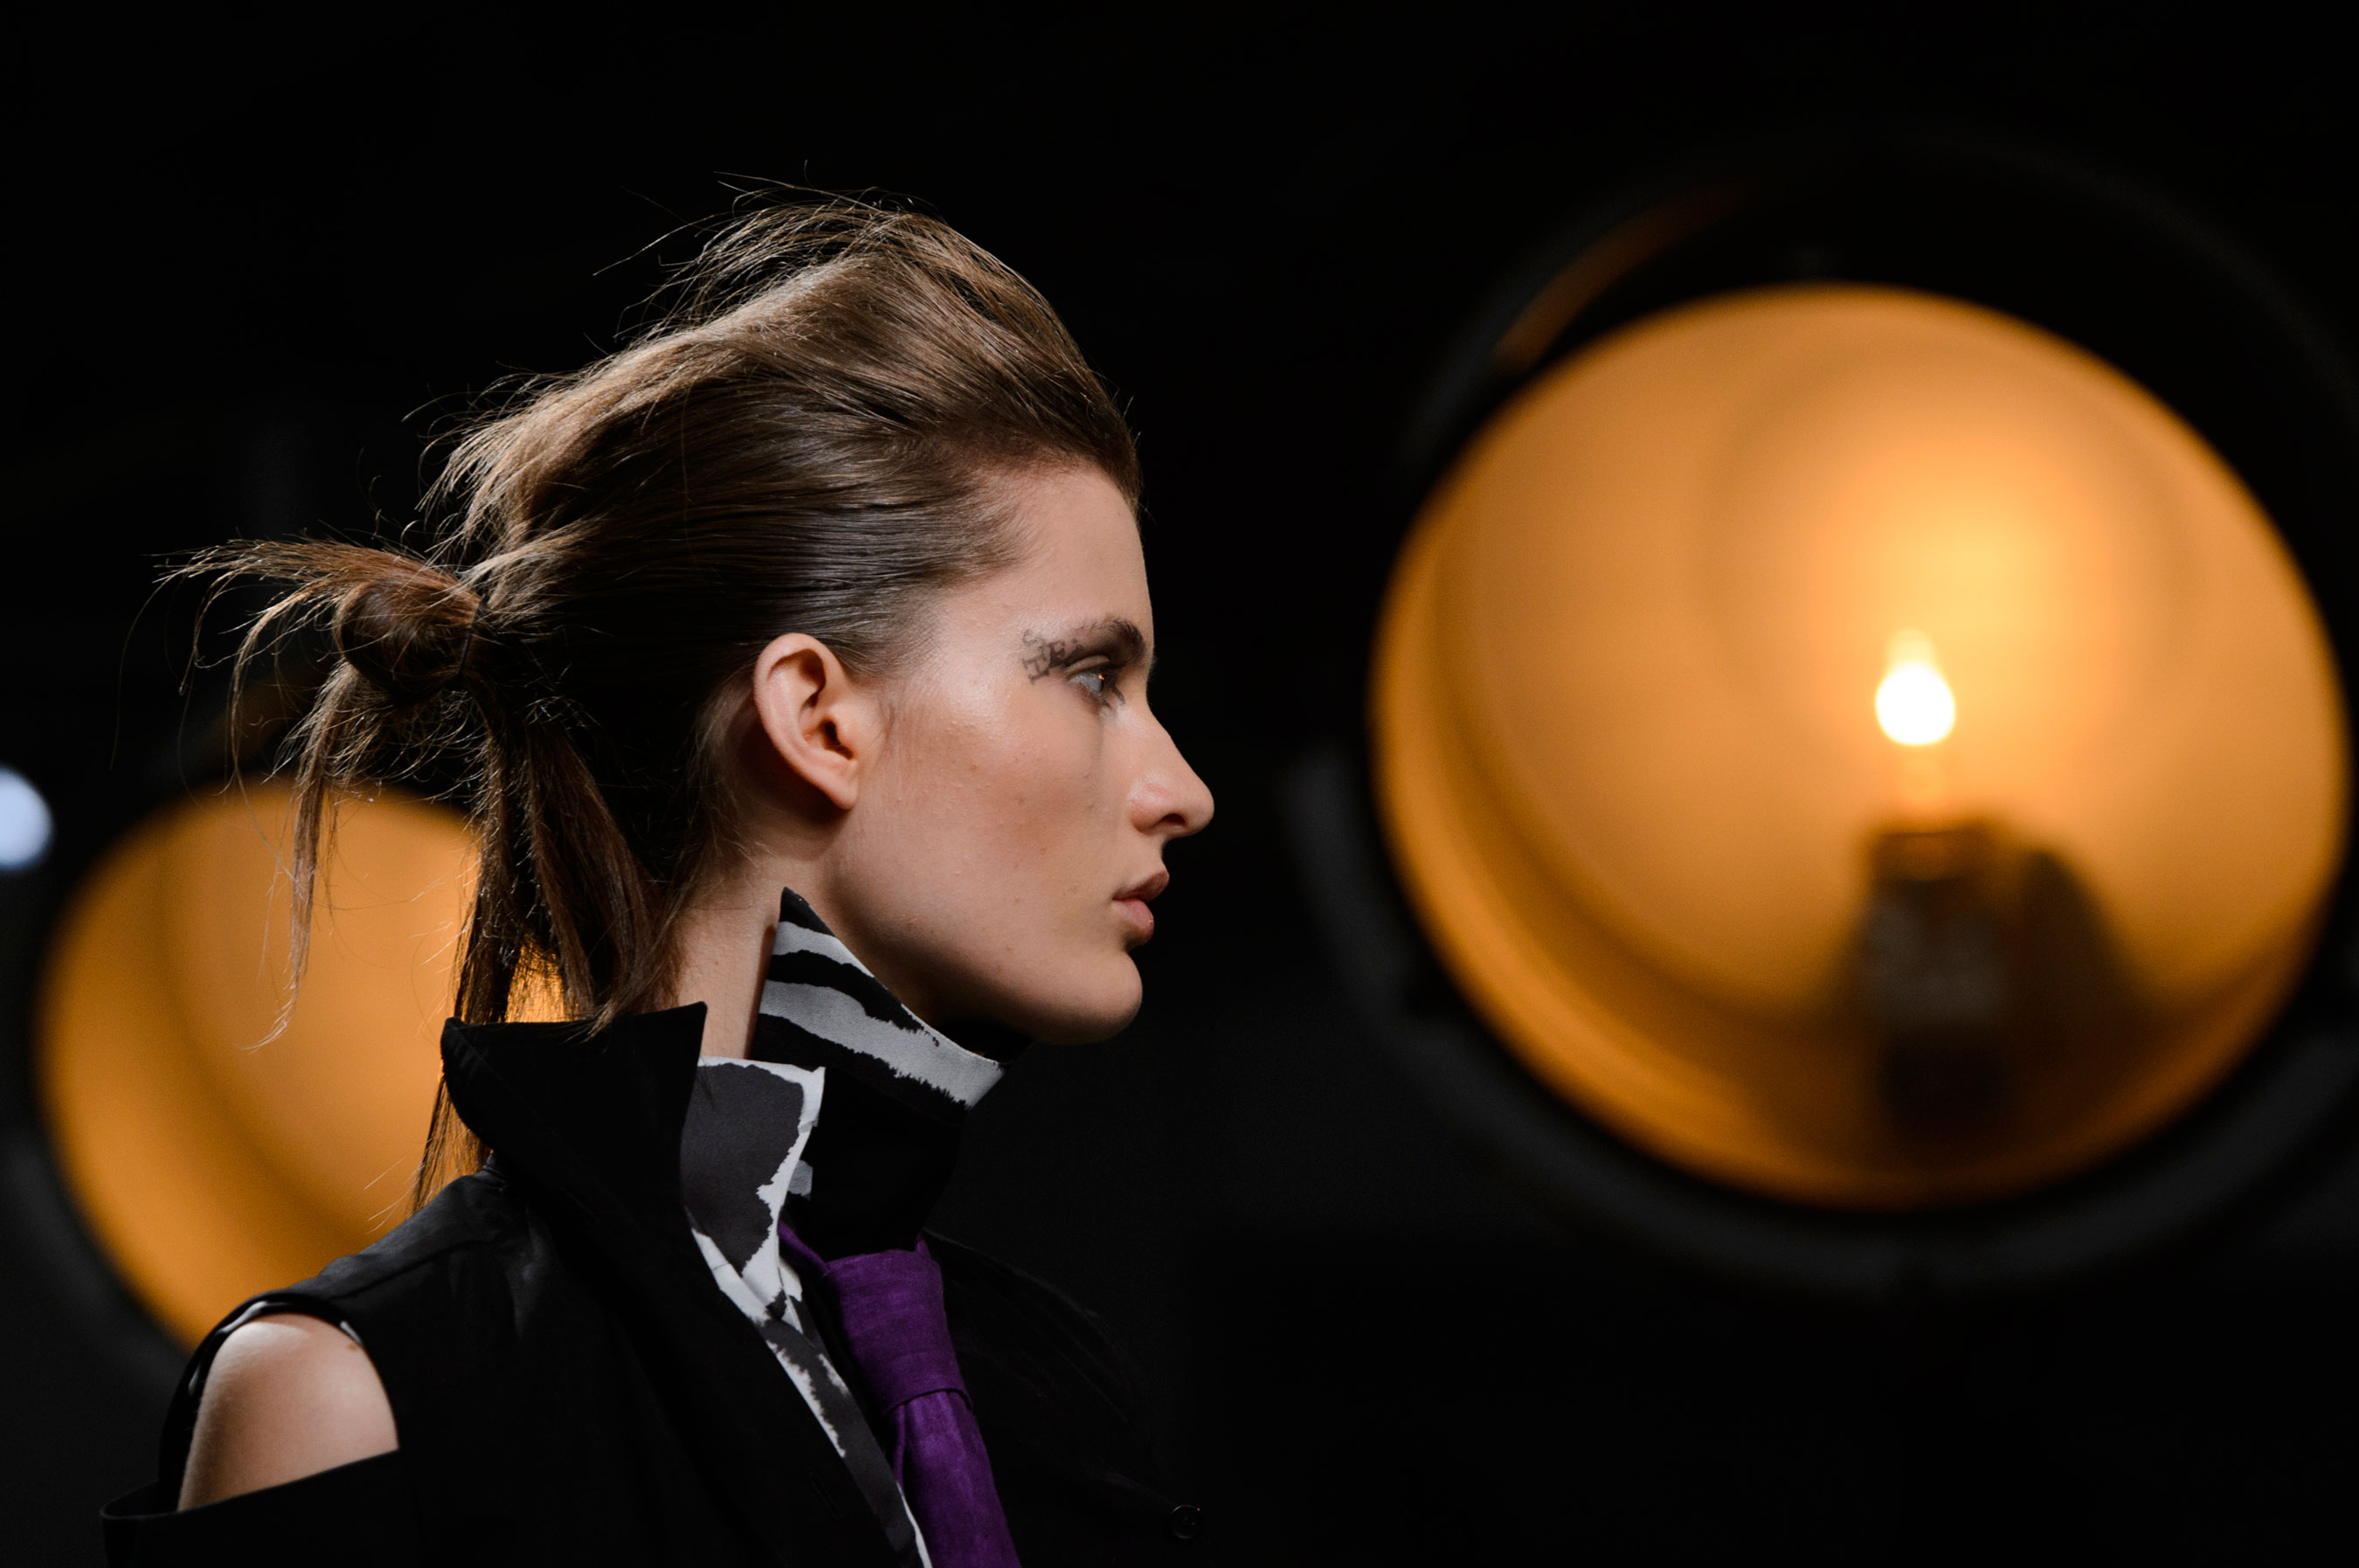 aganovich-spring-2016-runway-beauty-fashion-show-the-impression-19